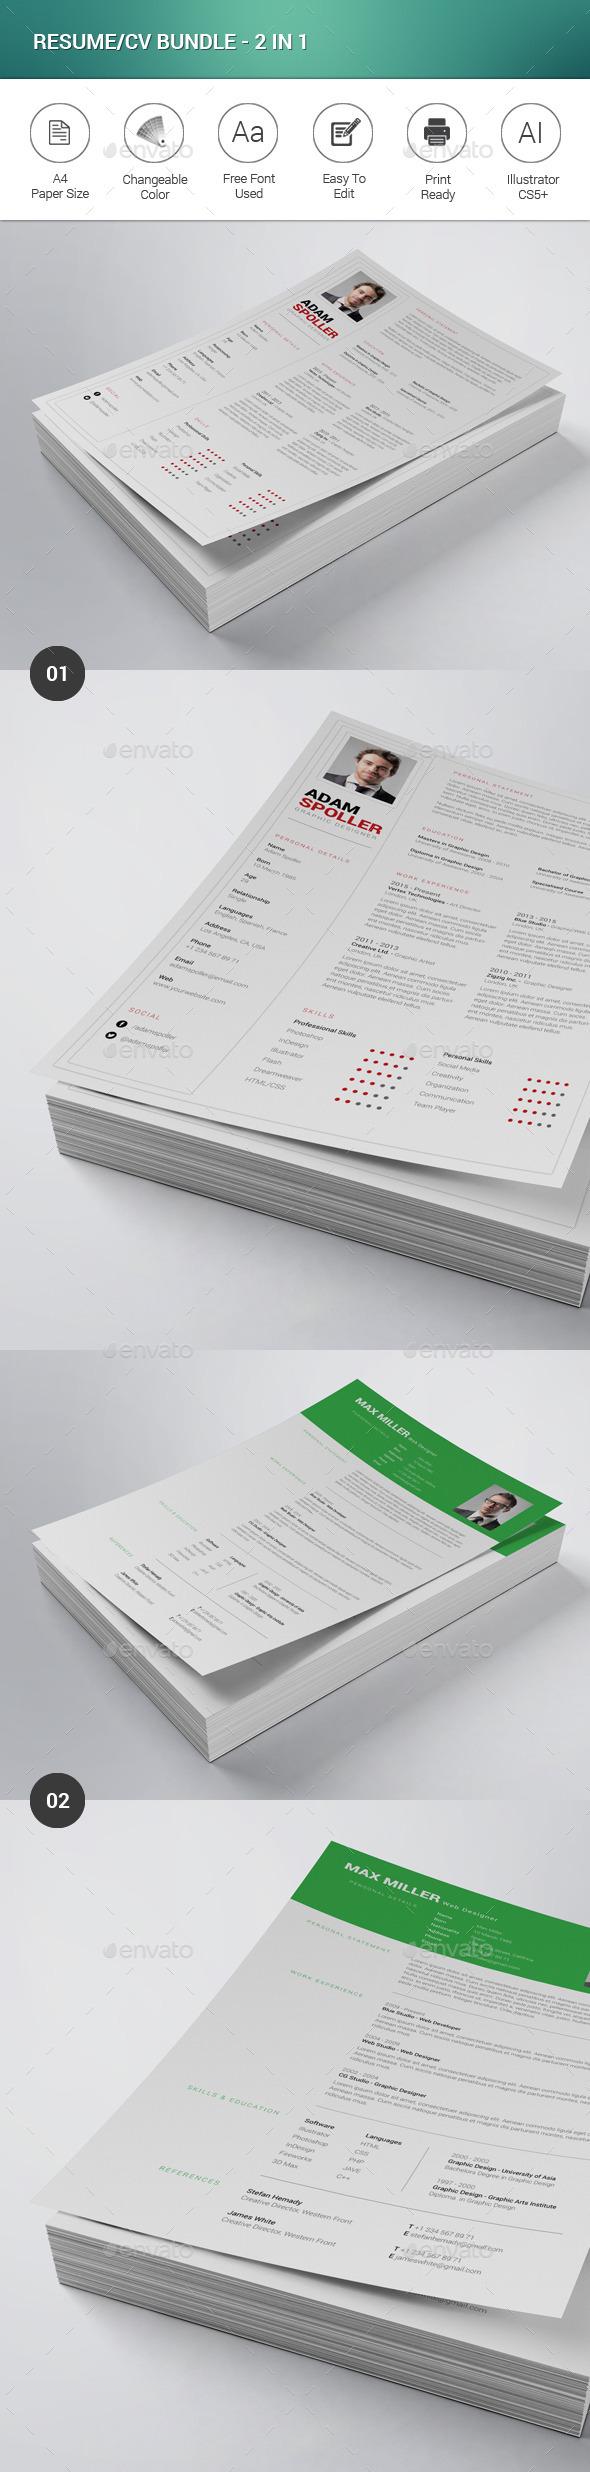 Resume/CV Bundle - 2 in 1 - Resumes Stationery